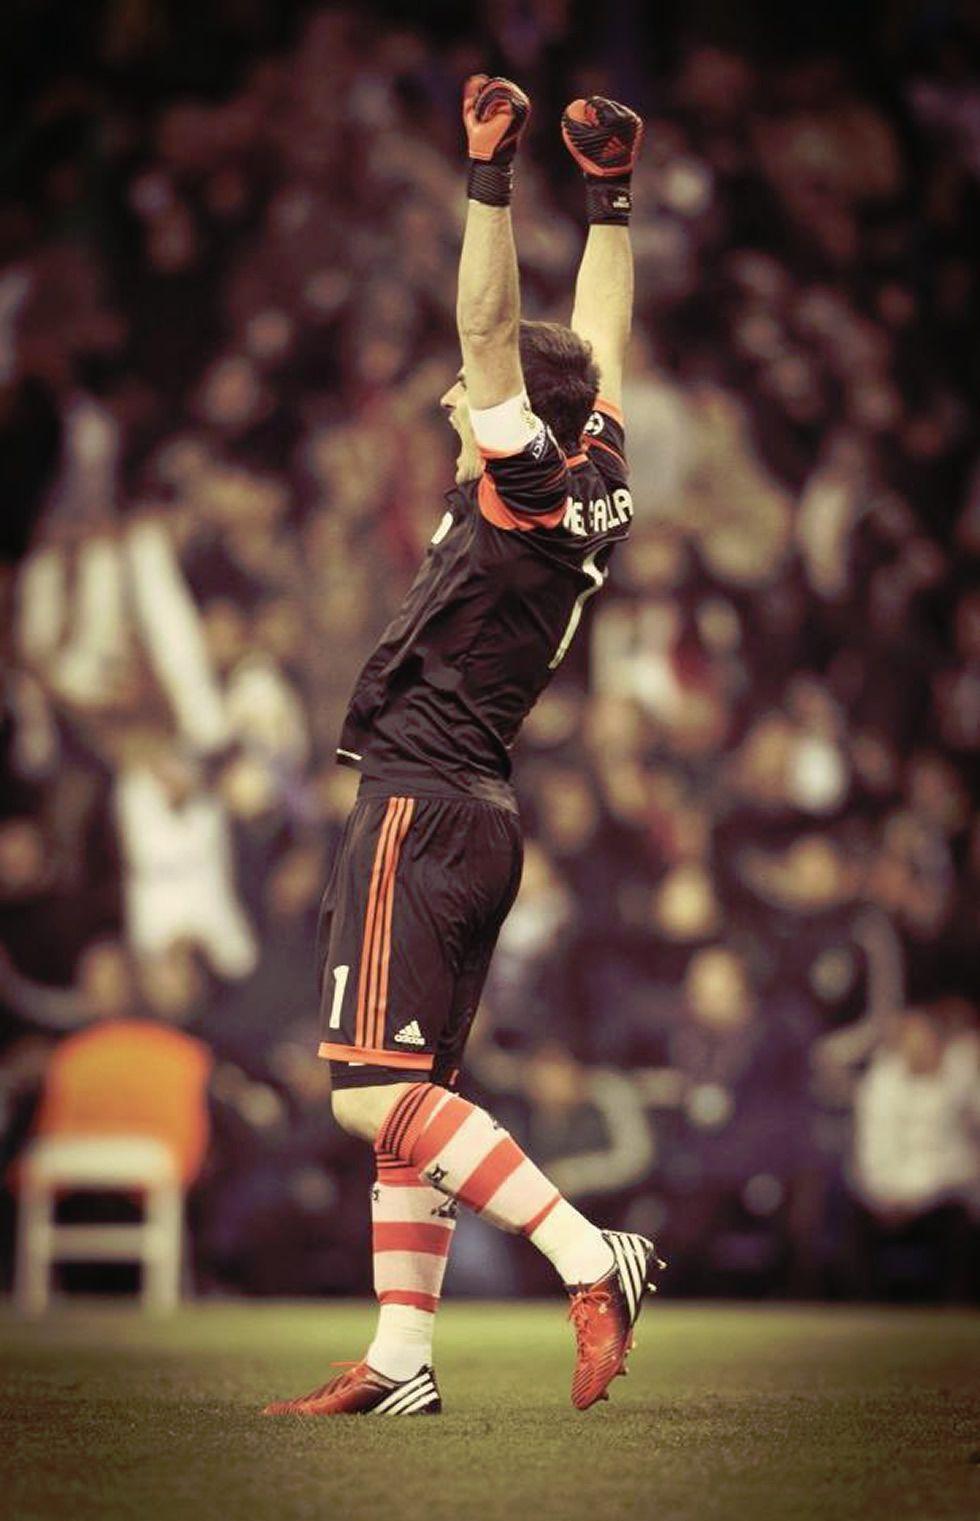 http://futbol.as.com/futbol/imagenes/2012/11/09/portada/1352476119_871066_1352476625_noticia_grande.jpg